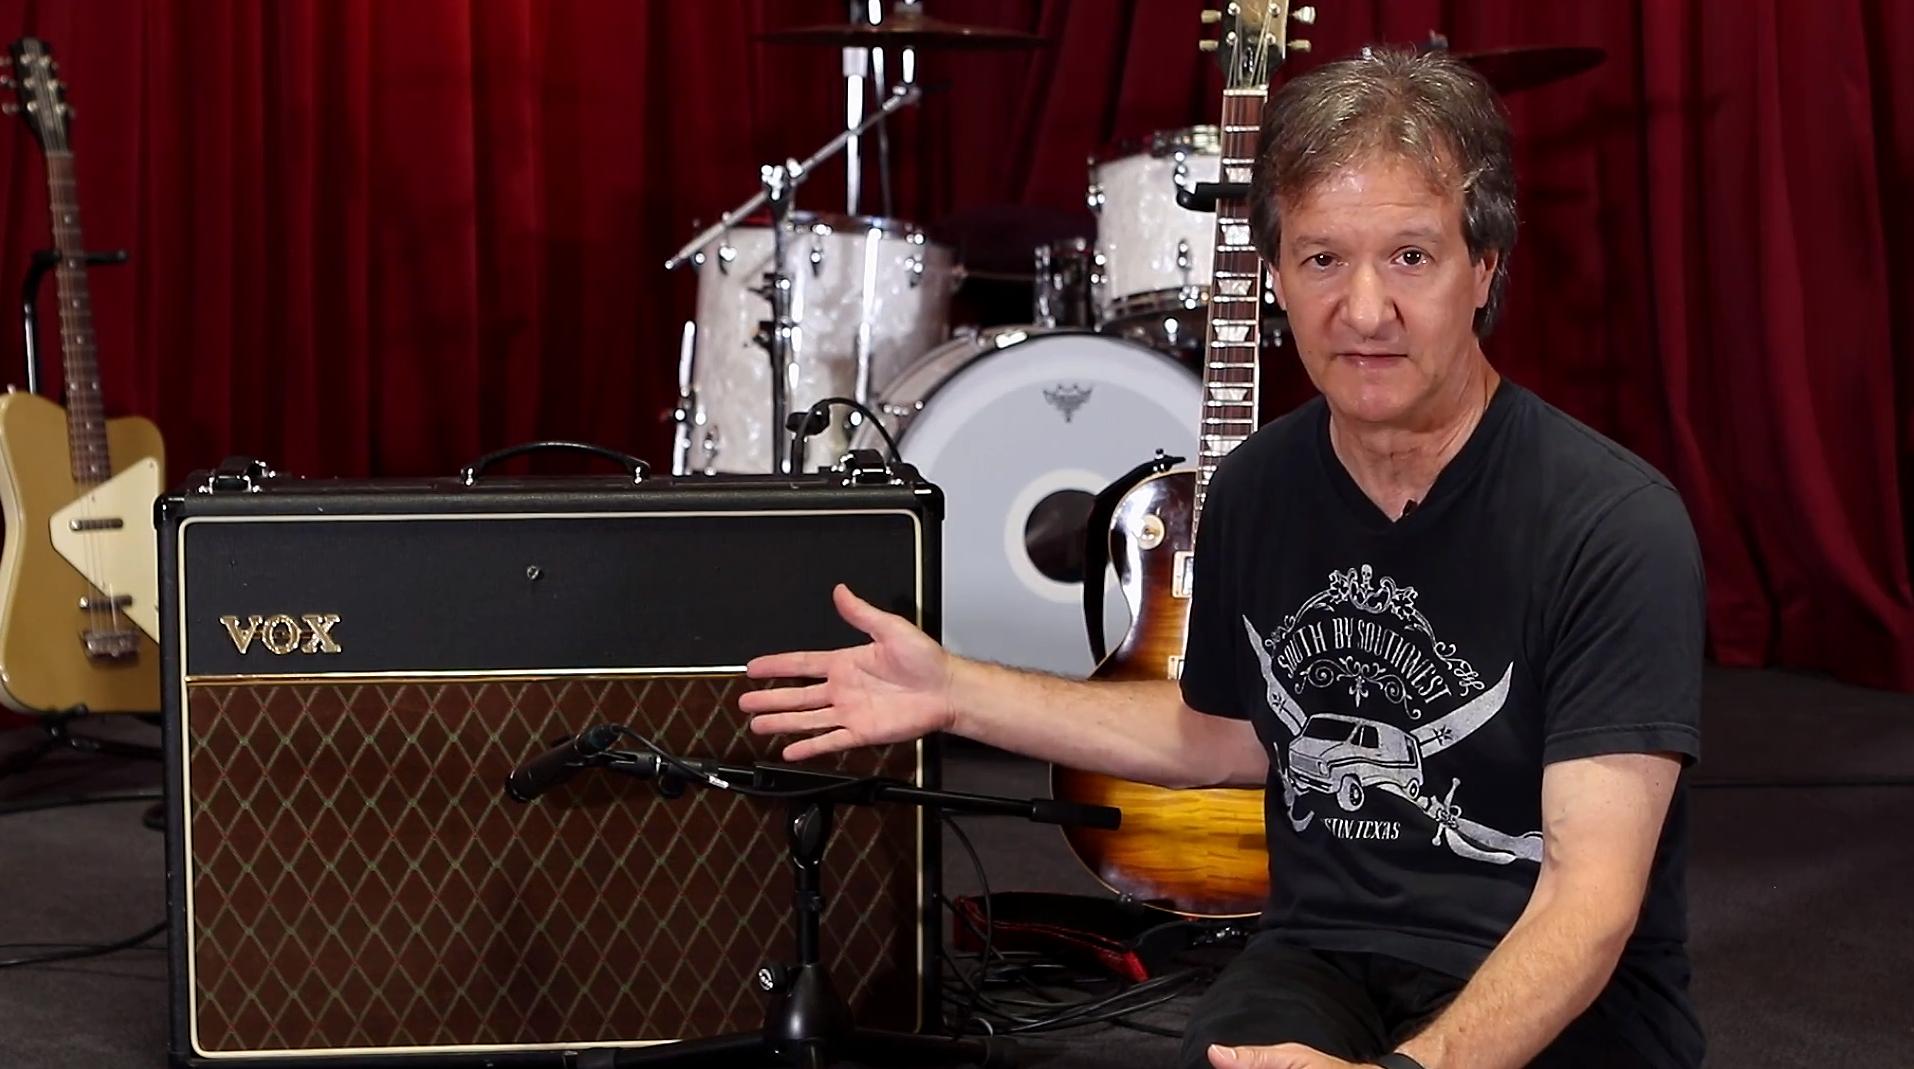 Bob Clearmountain showing mic placement using a Shure SM57